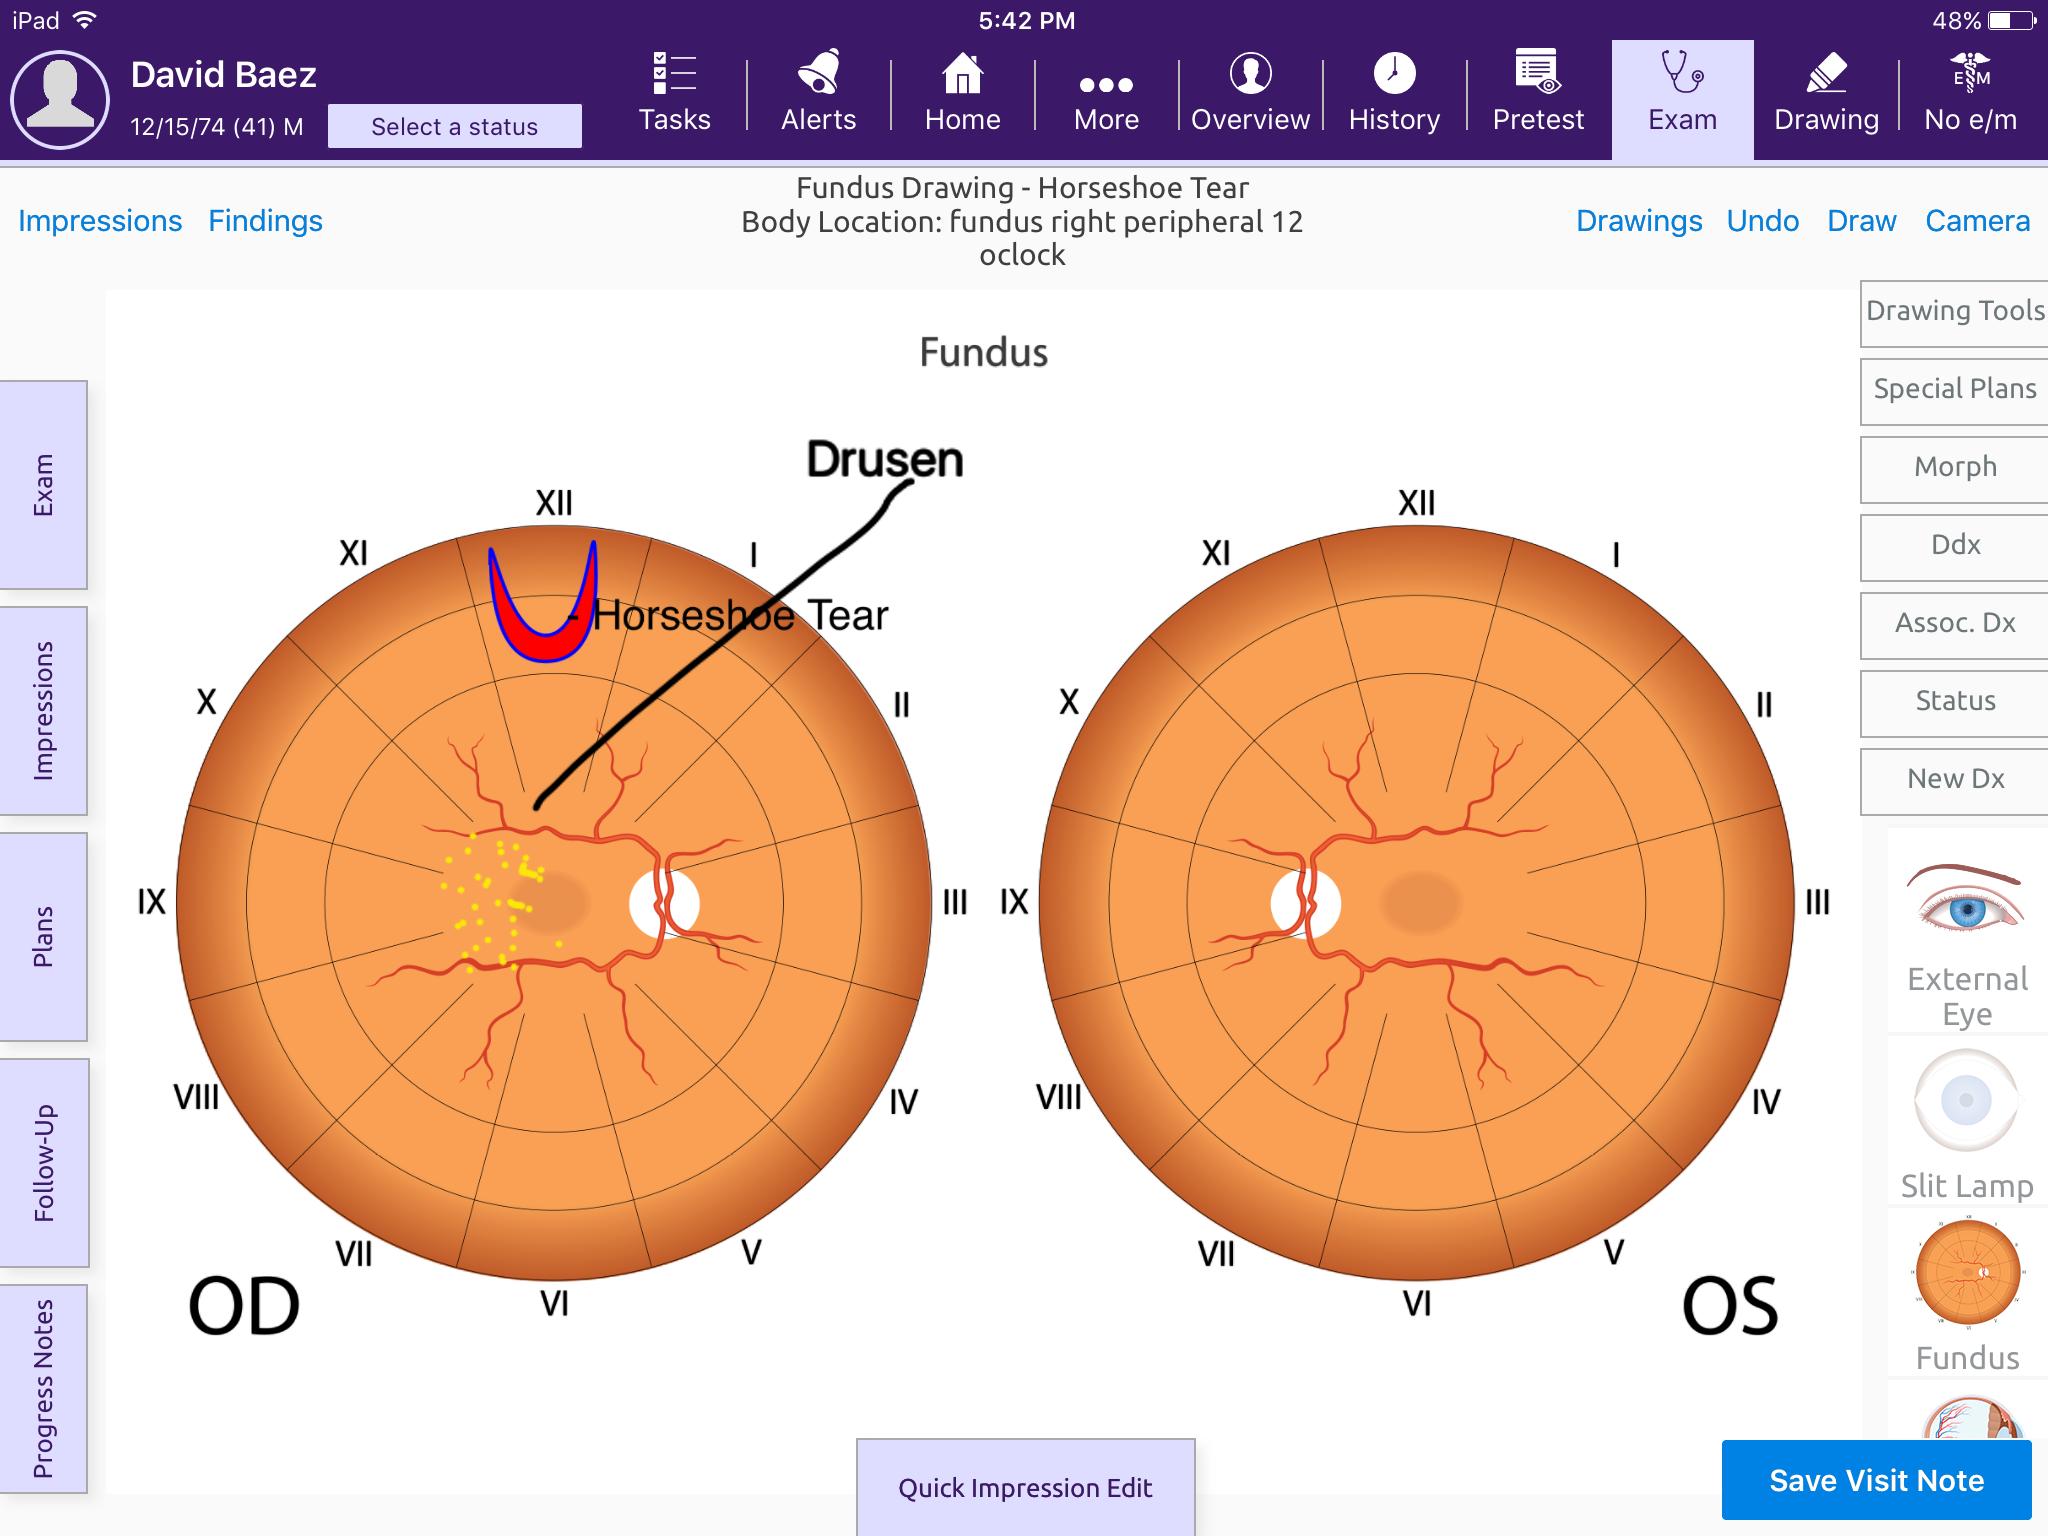 Modernizing Medicine's EHR & Healthcare IT Suite - Ophthalmology